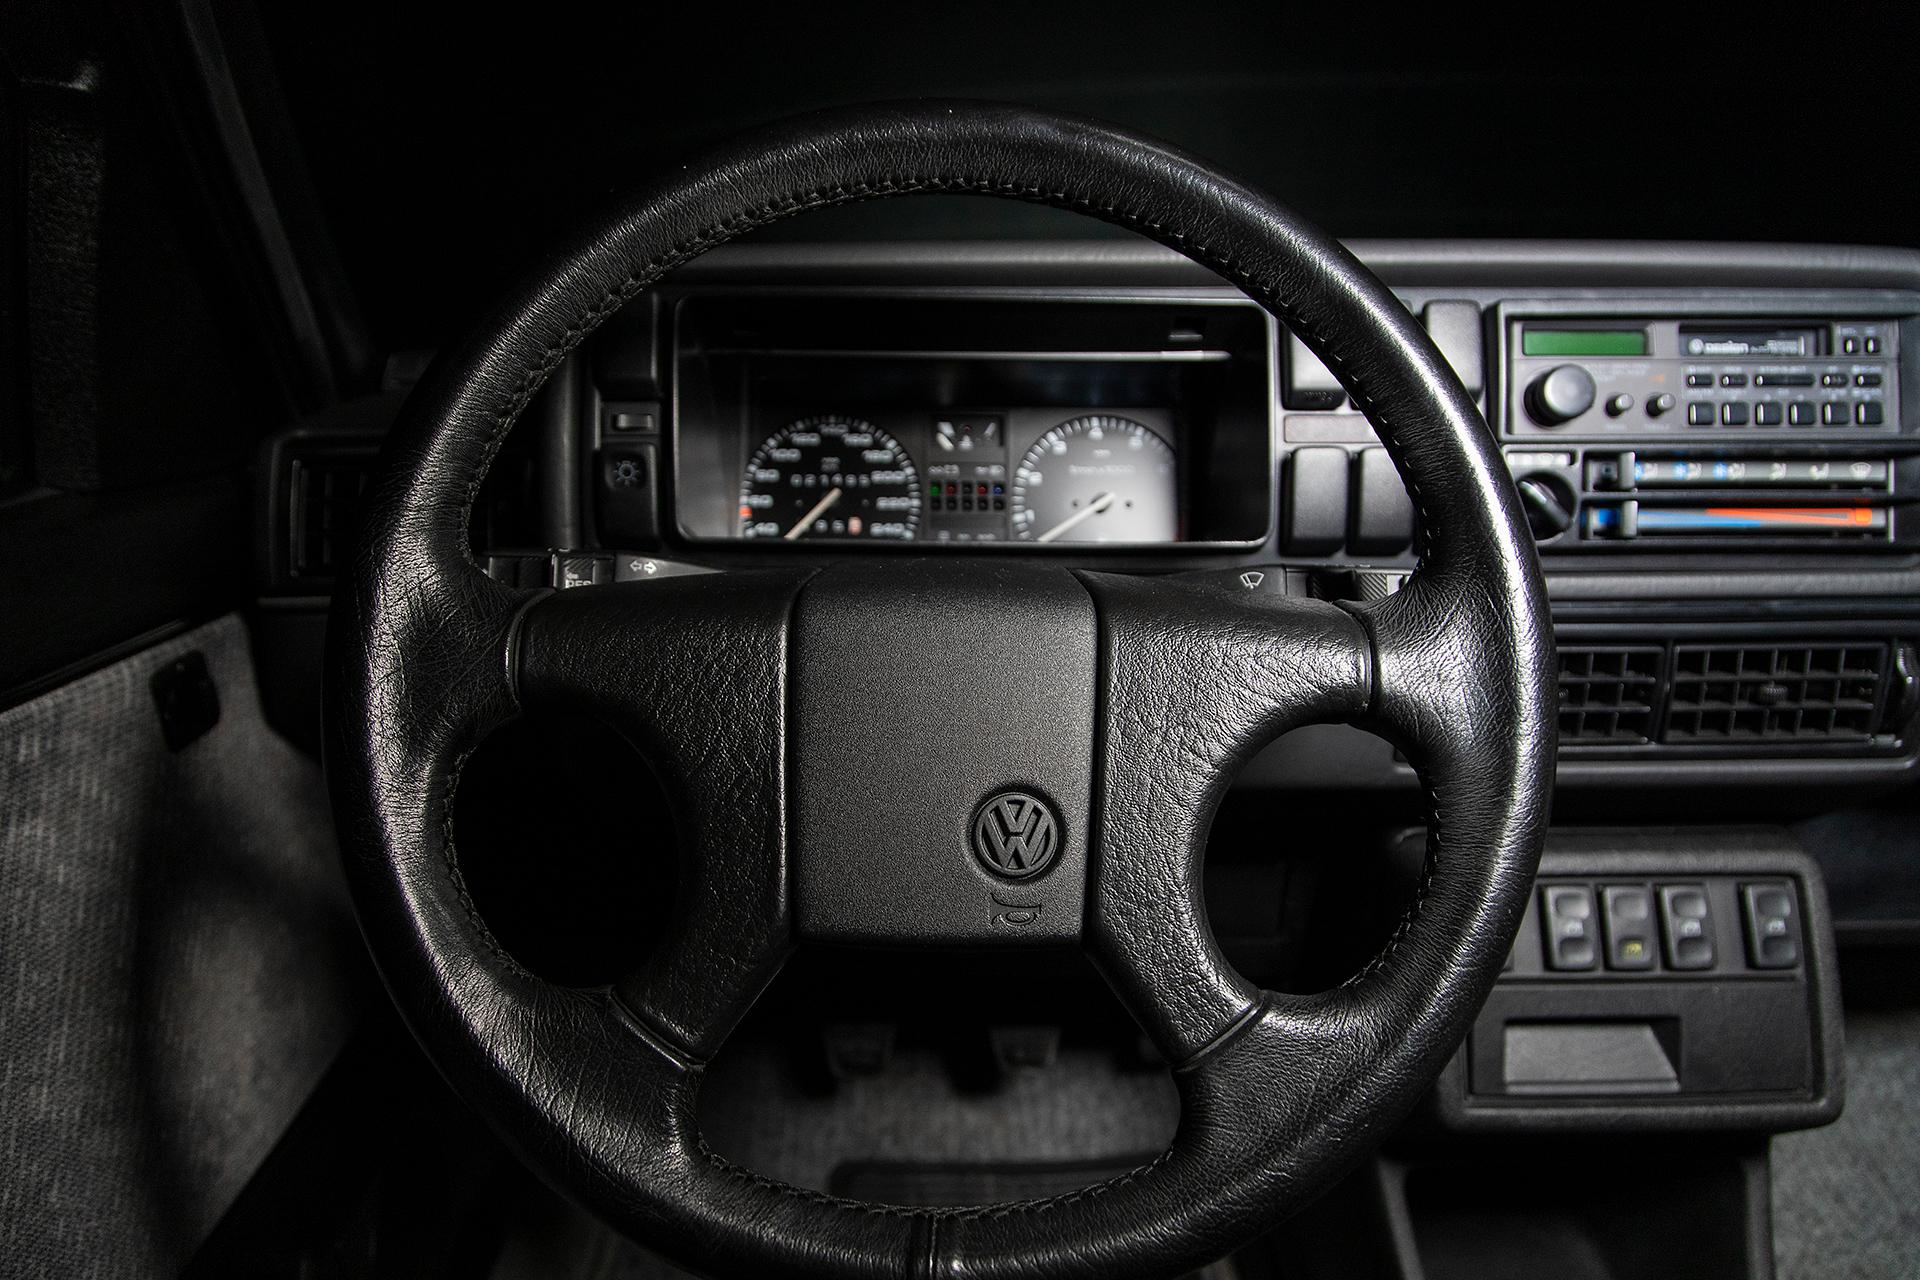 1989_volkswagen_jetta_gli_16v_1582649952cfcd216